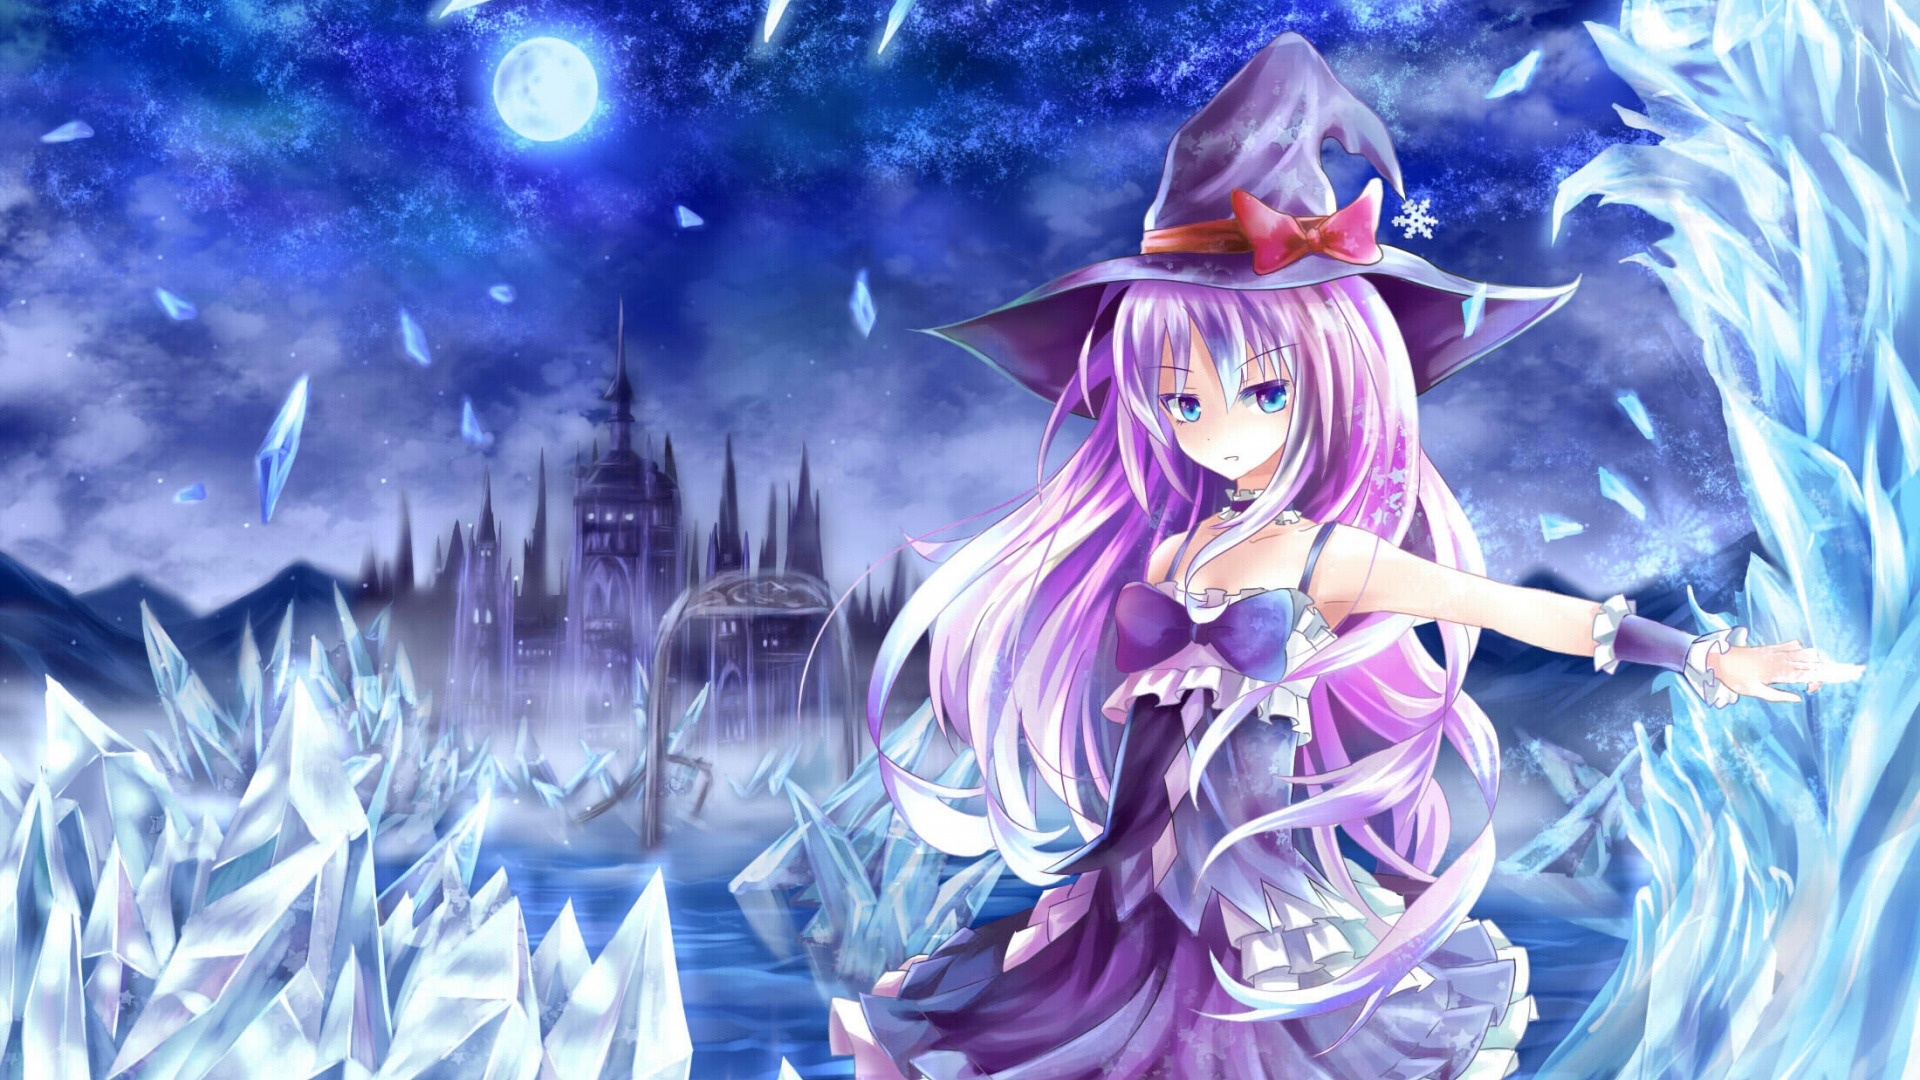 Anime Girl Magician Desktop Wallpaper